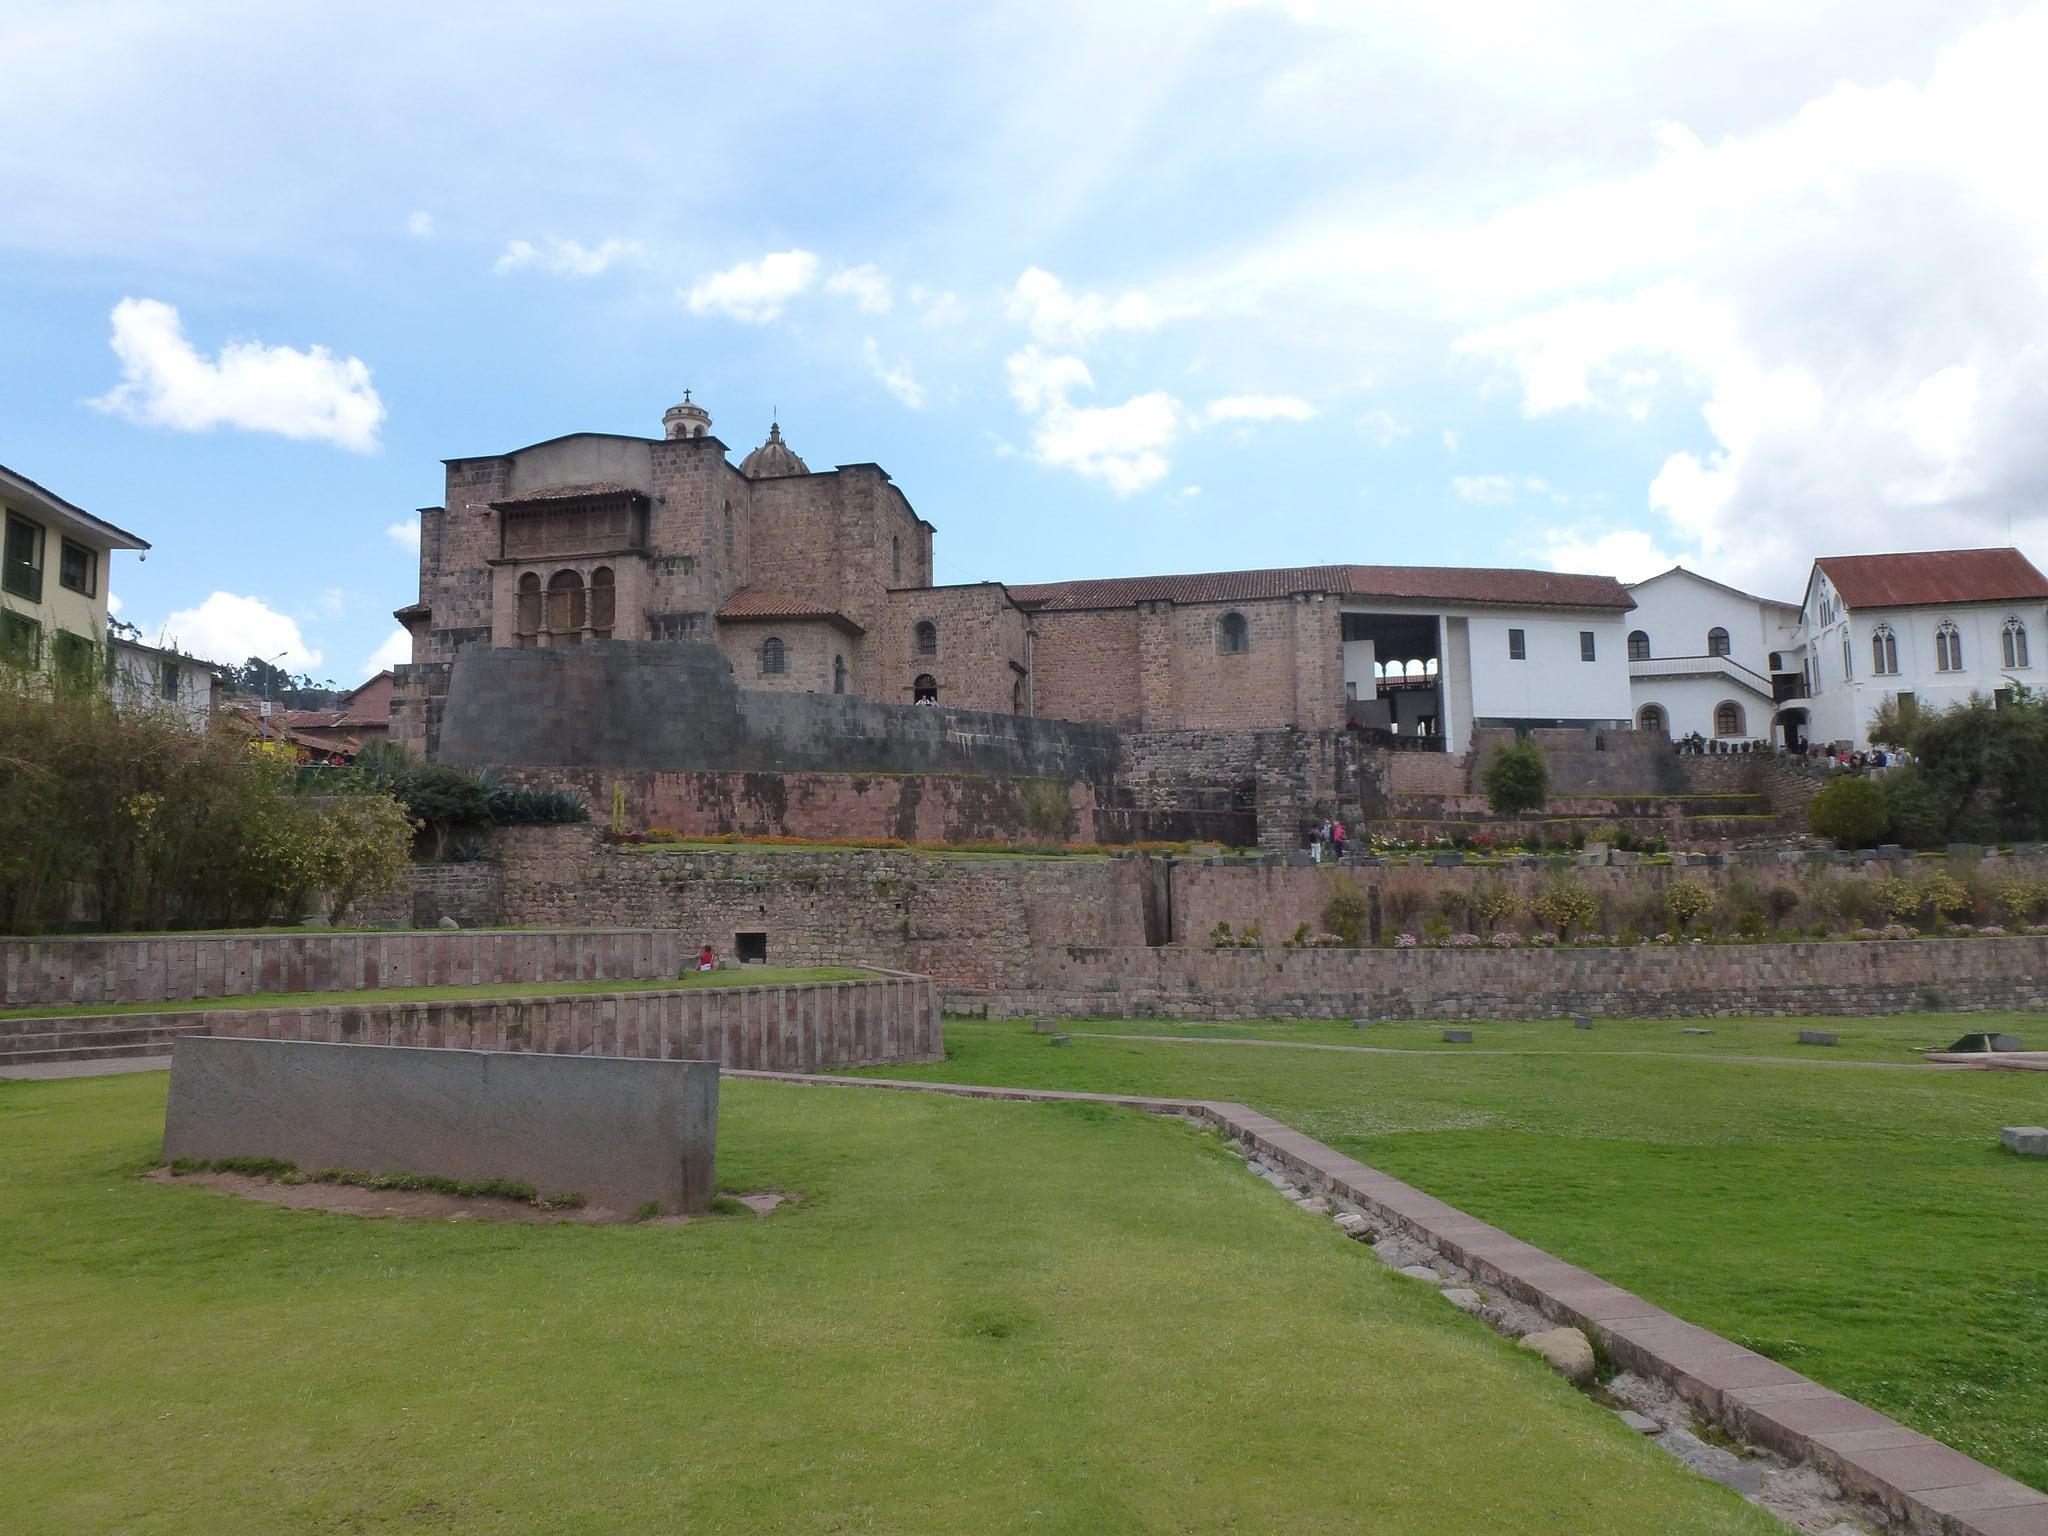 Bild von Qoricancha. peru museum cusco museo qoricancha